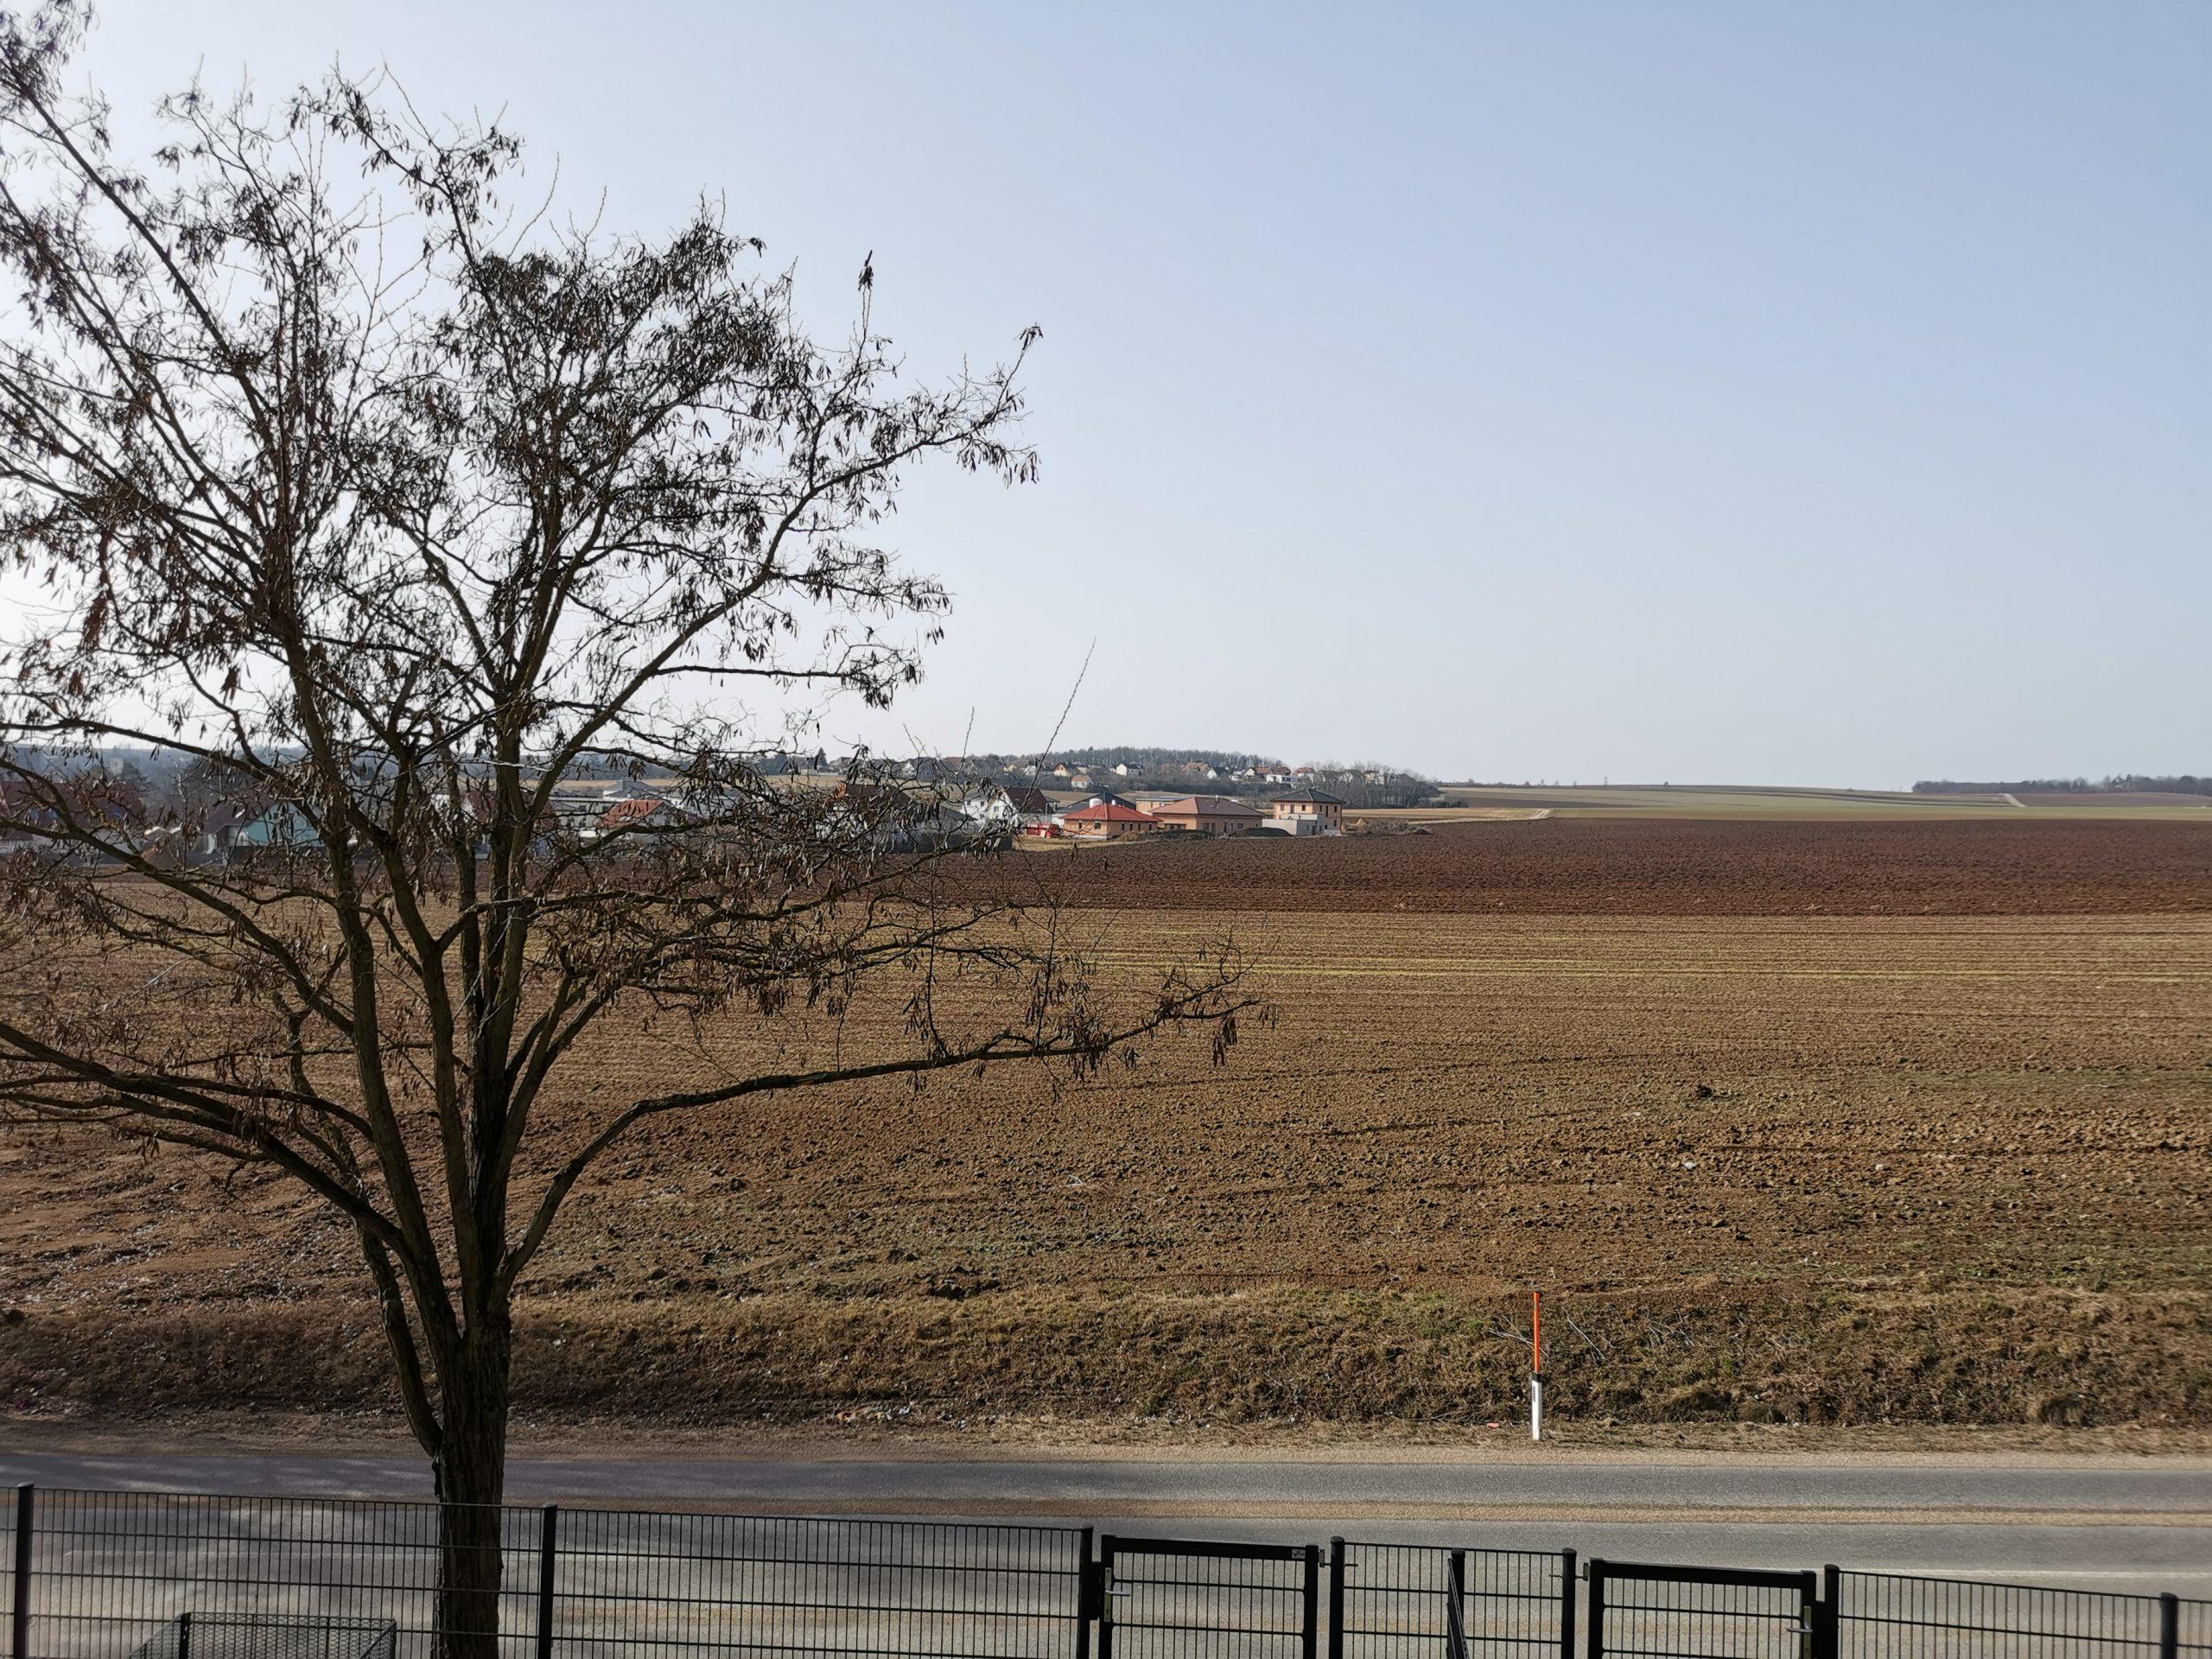 Immobilie von Kamptal in 3730 Eggenburg, Horn, Eggenburg VII - Top 106 #3